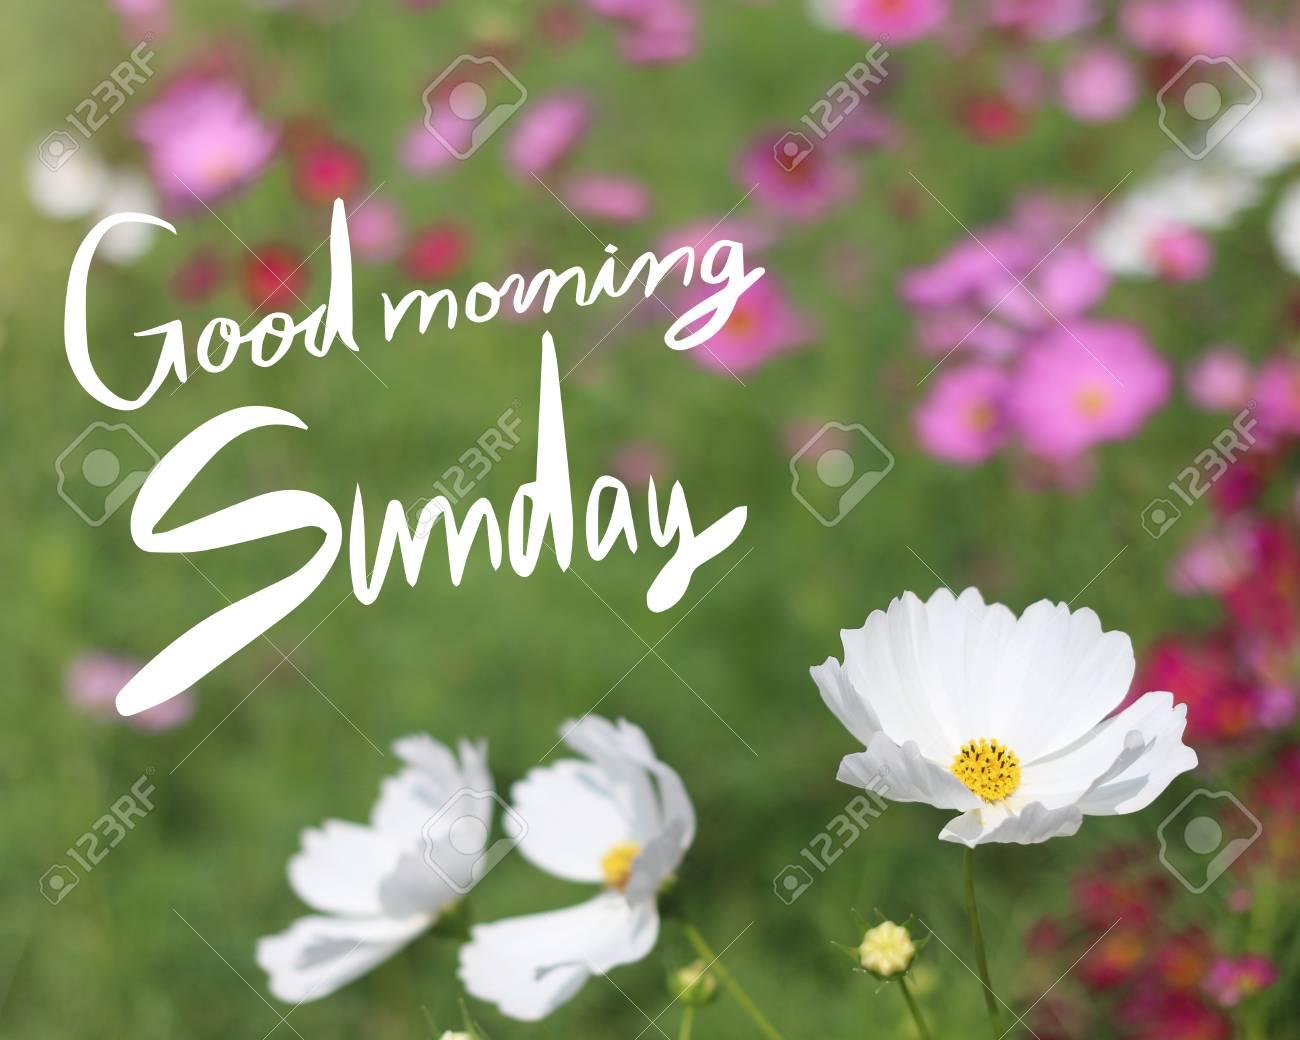 Inspirational Quote Good Morning Sunday On Flowers Background